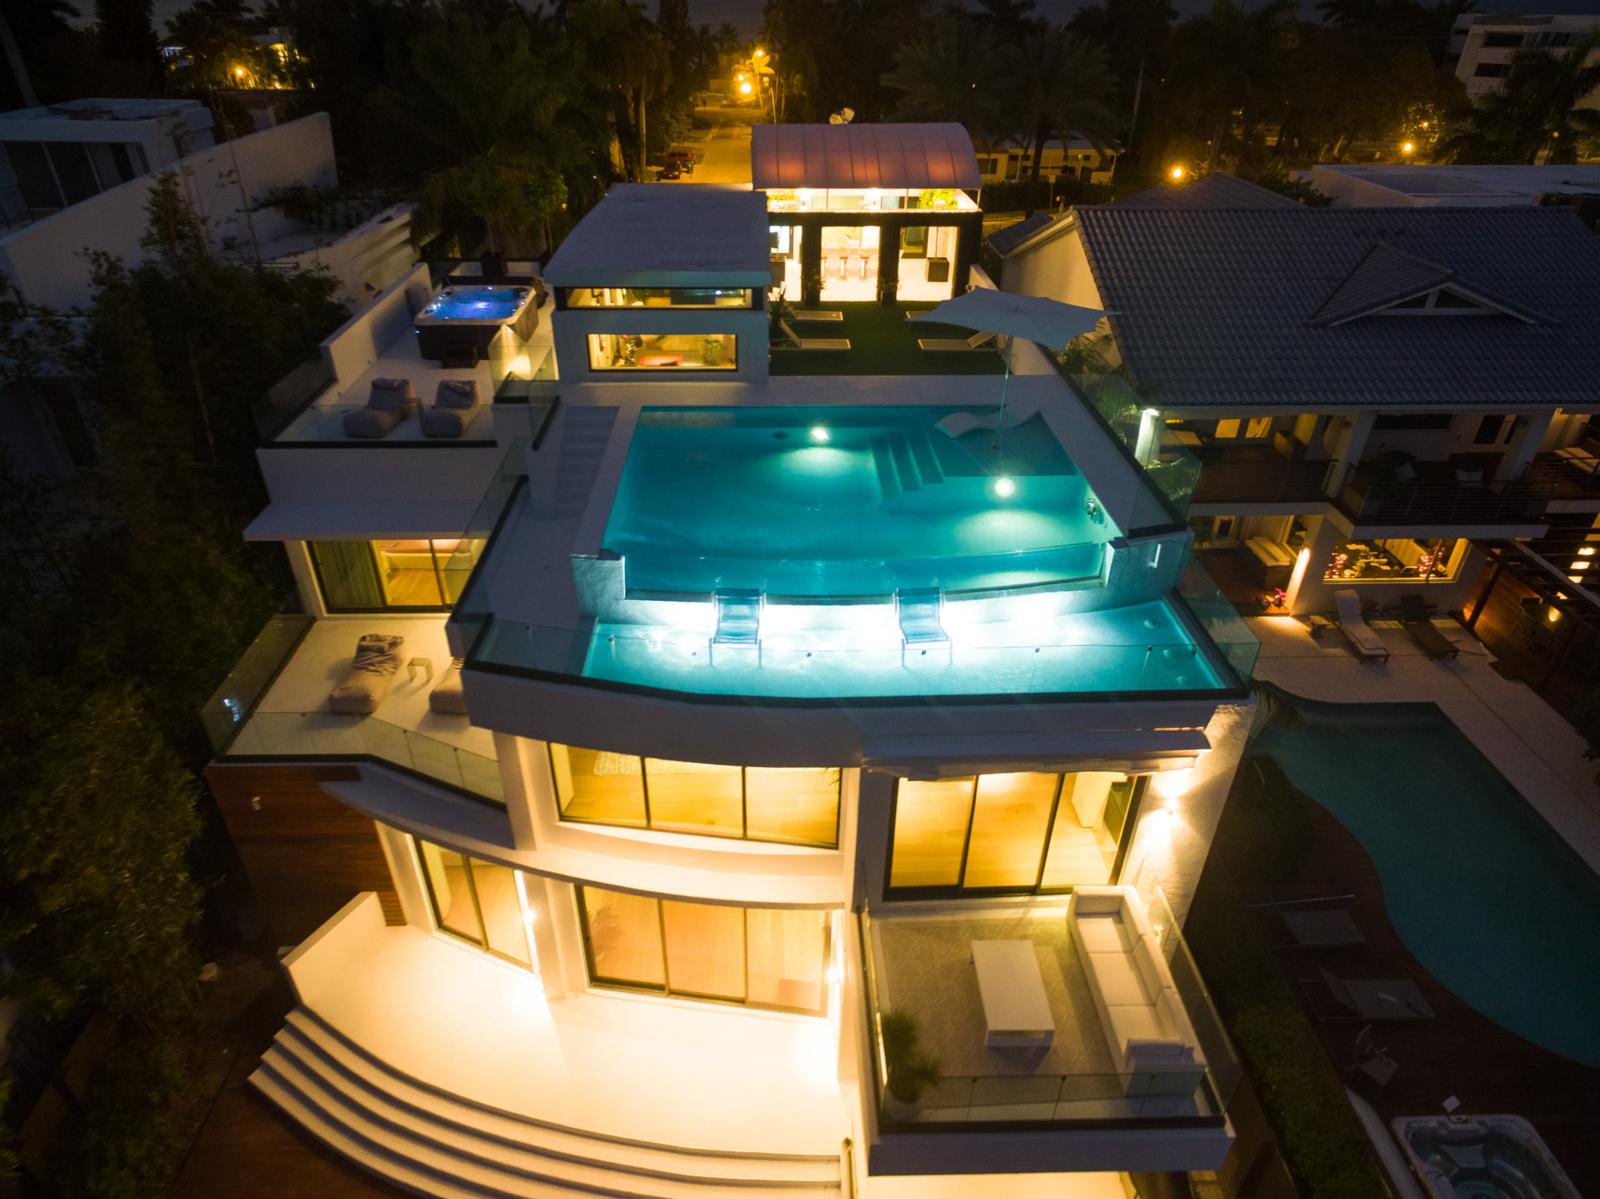 Exterior Rear Residence at Night